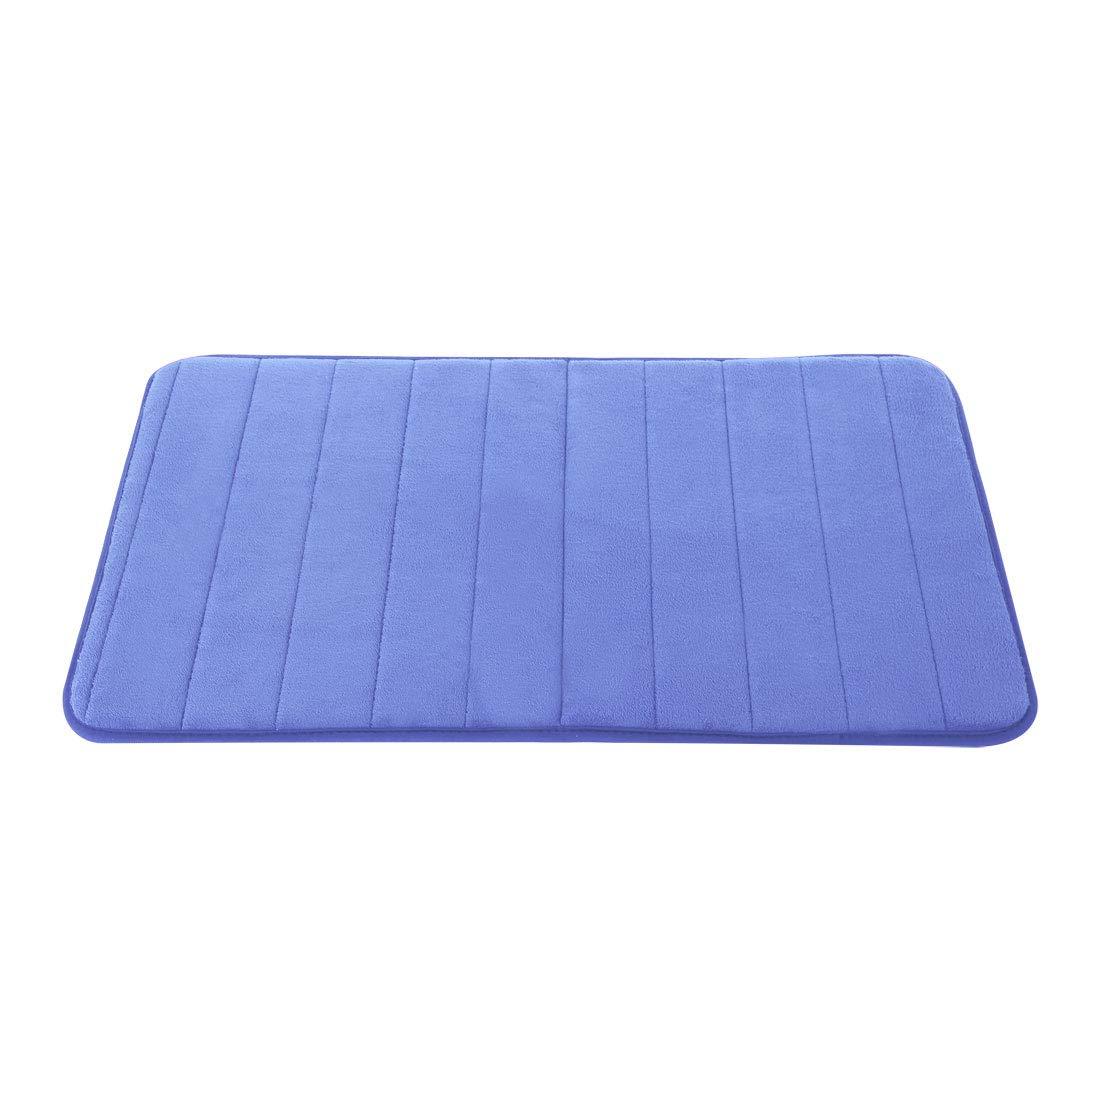 uxcell Bathroom Mats Non-Slip Soft Absorbent Memory Foam Rugs Carpet Blue 32 x 20 Inch